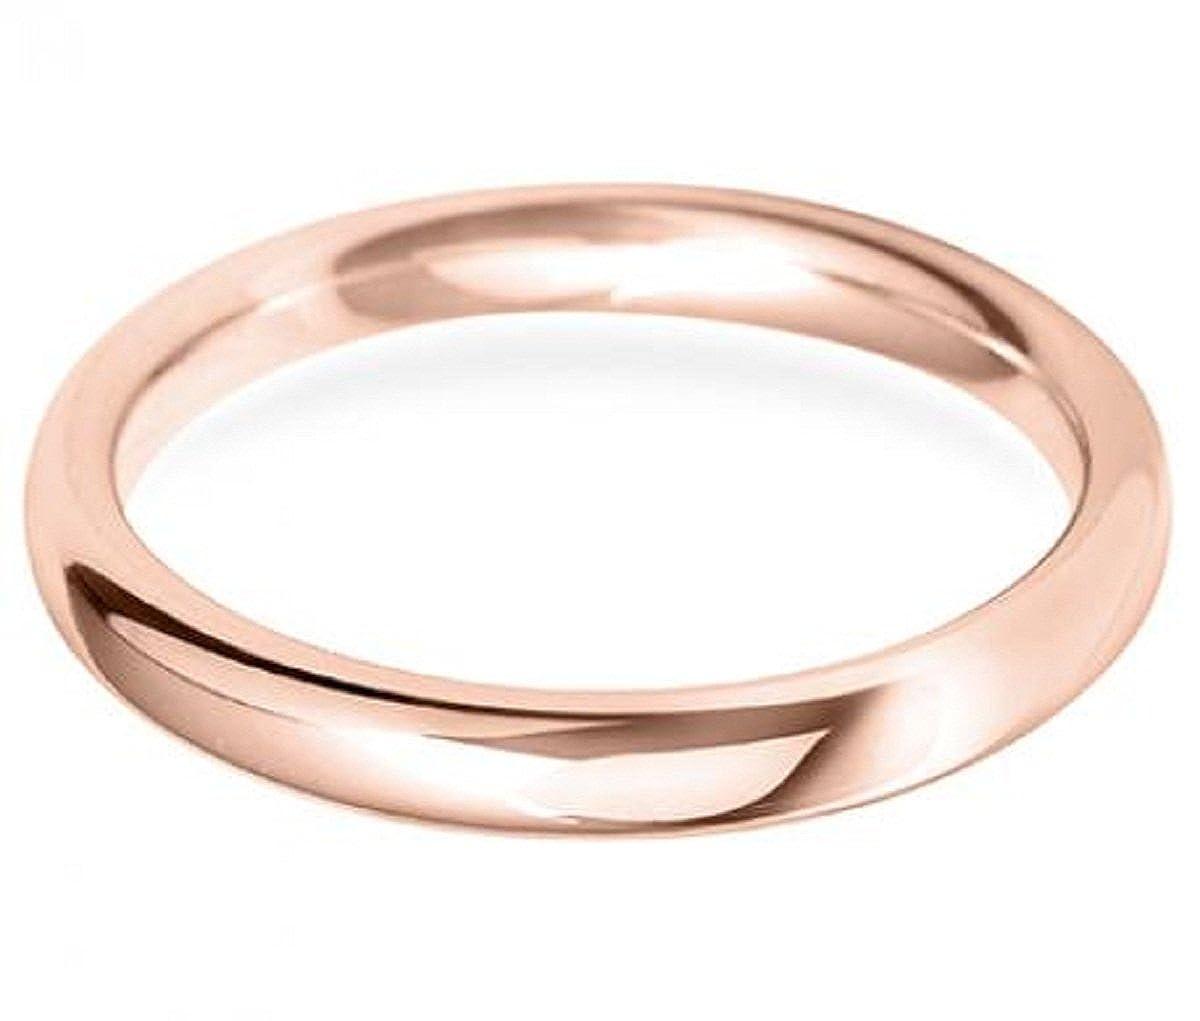 Dabangjewels 14k Rose Gold Plated 2.5 mm Plain Simple High Polish Classic Comfort Fit Engagement Wedding Band Ring